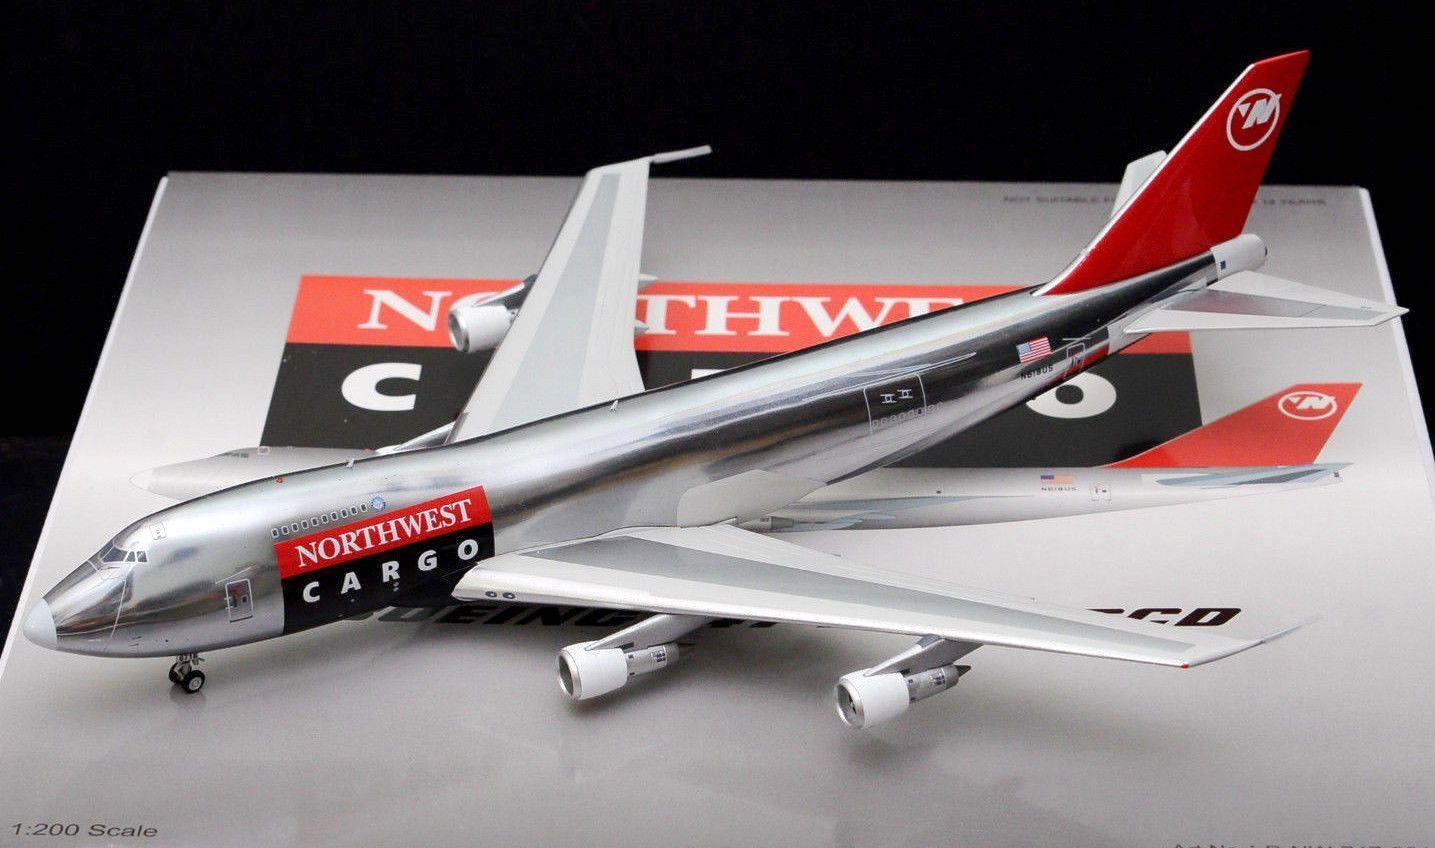 WBNW747001P 1 200 Northwest Airlines Cargo 747-200 N618US W   Stand Ltd Edition